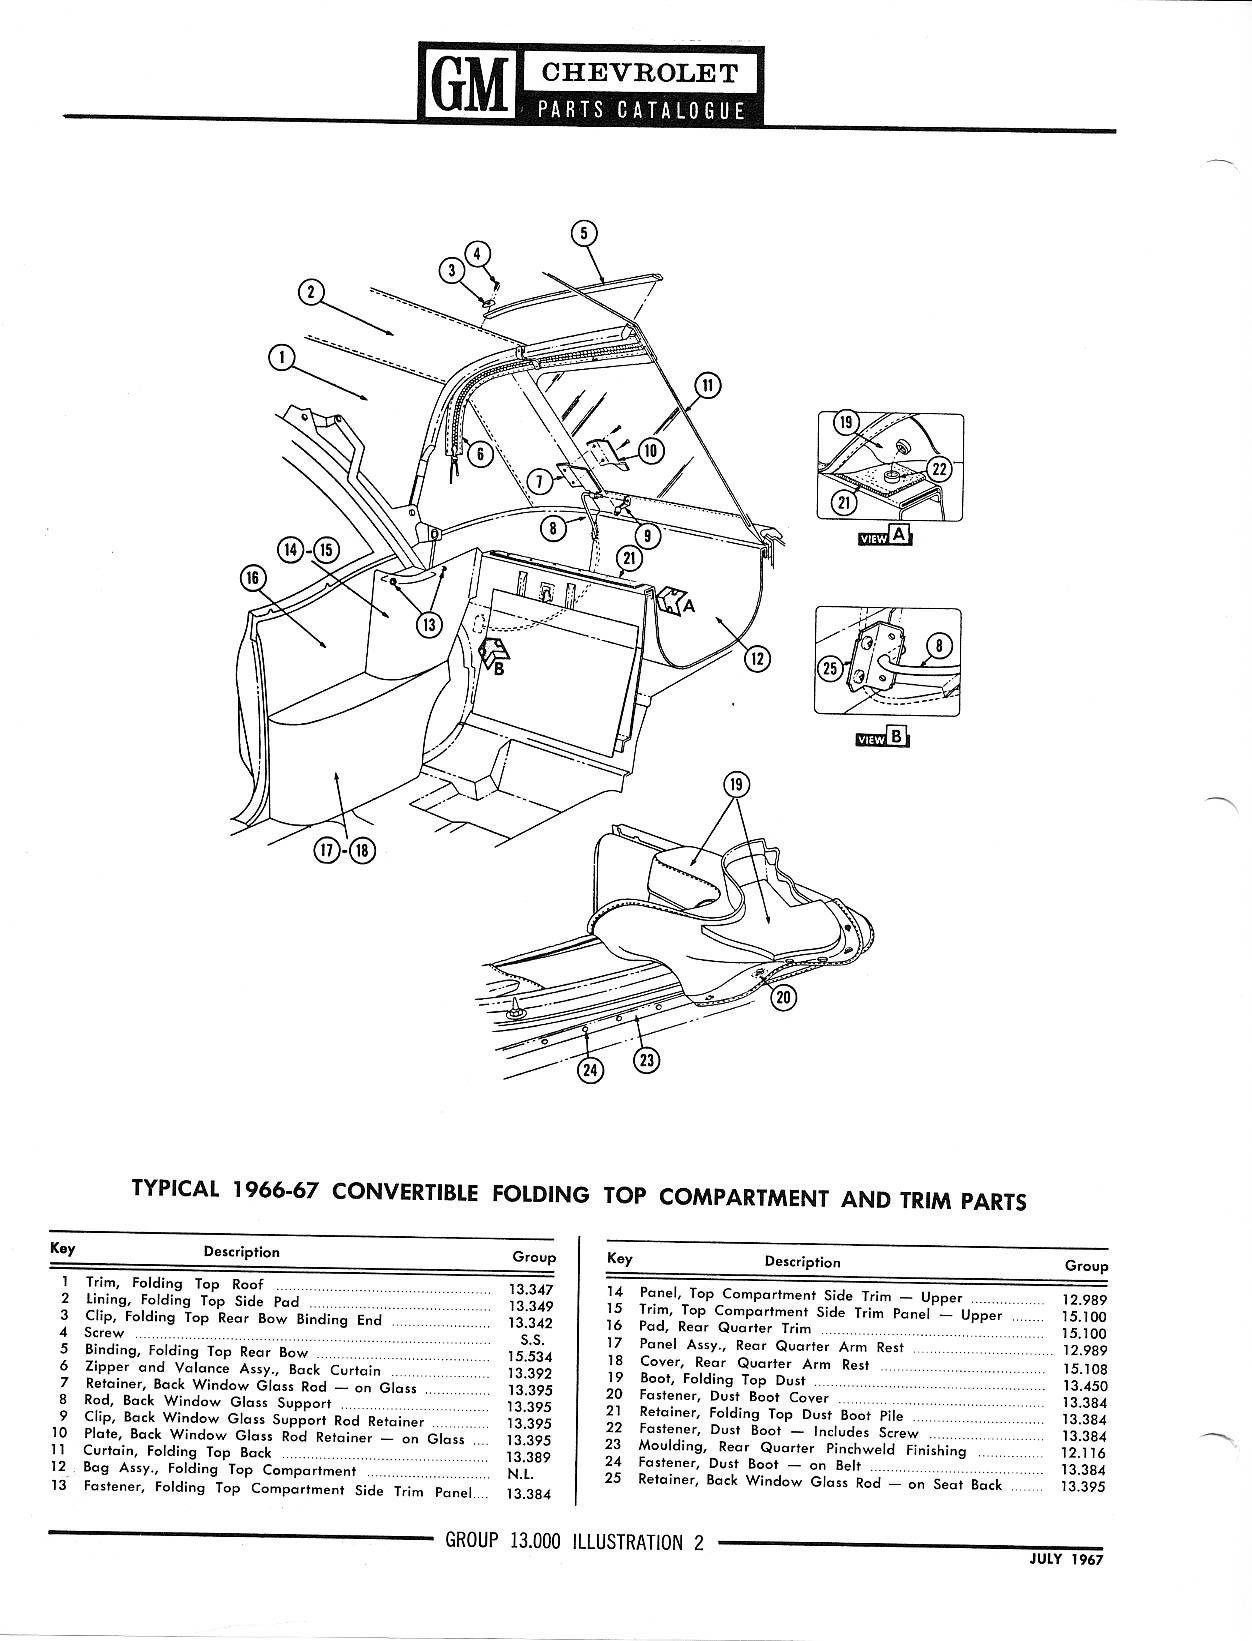 1958-1968 Chevrolet Parts Catalog / Image190.jpg